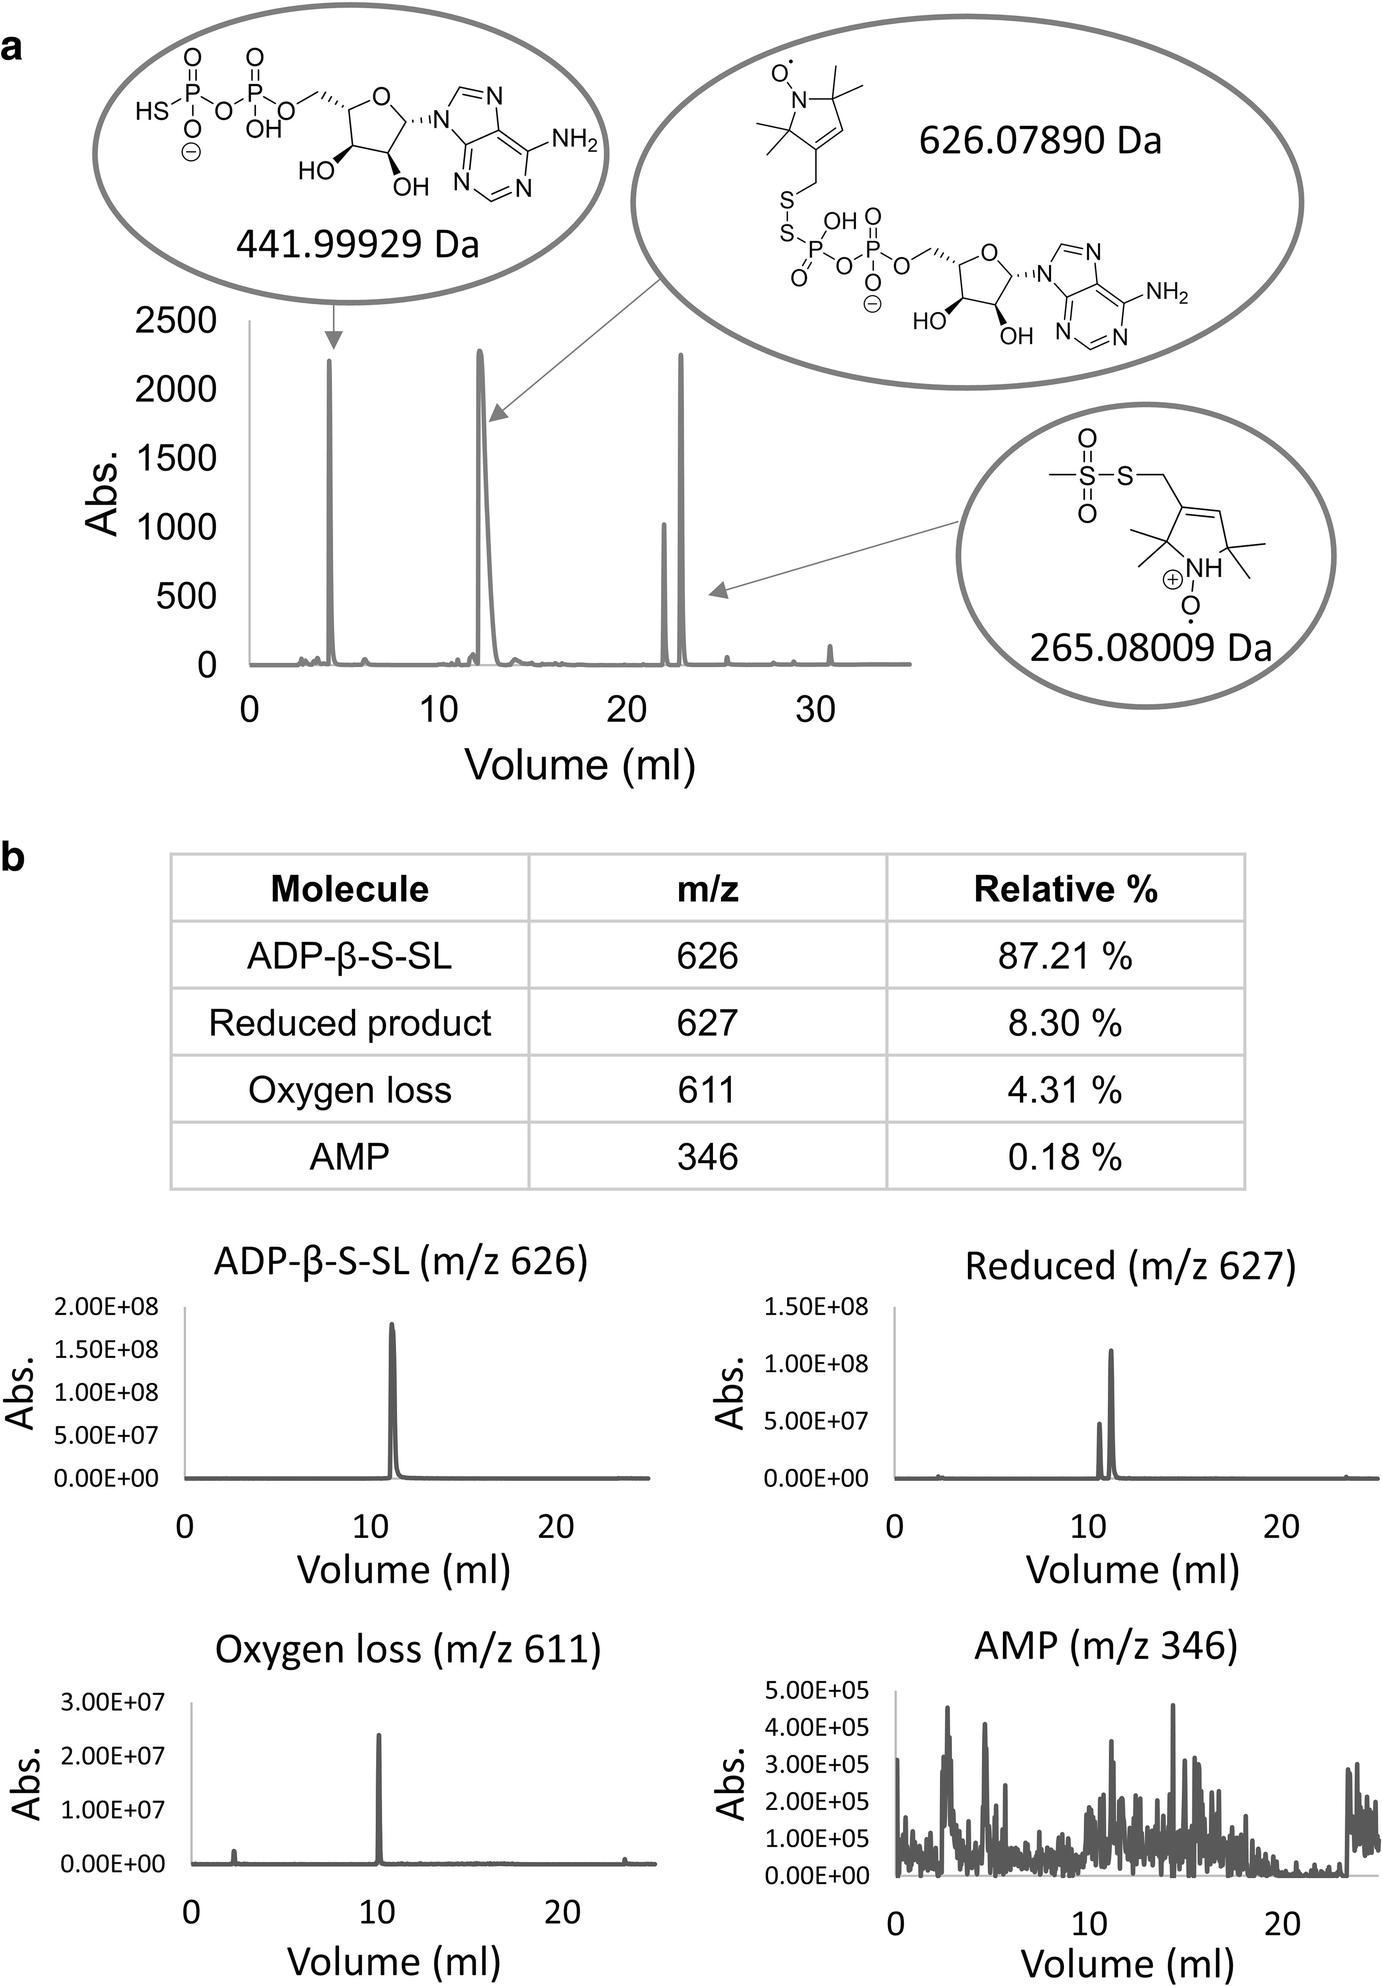 Nucleotide Spin Labeling For Esr Spectroscopy Of Atp Binding Relay 12 Volt 6 Kaki Open Image In New Window